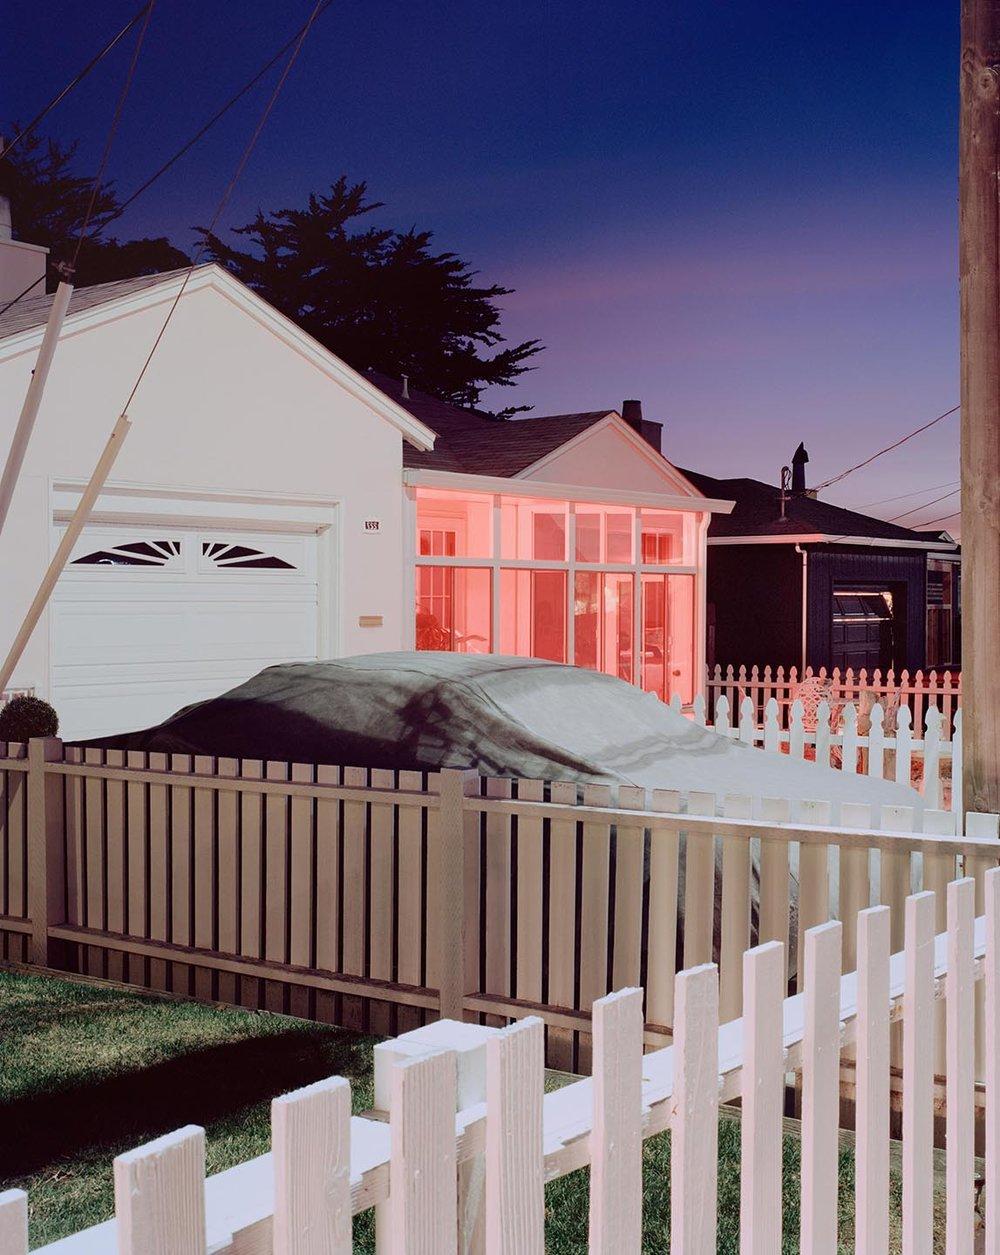 redhouse-coveredcar.jpg